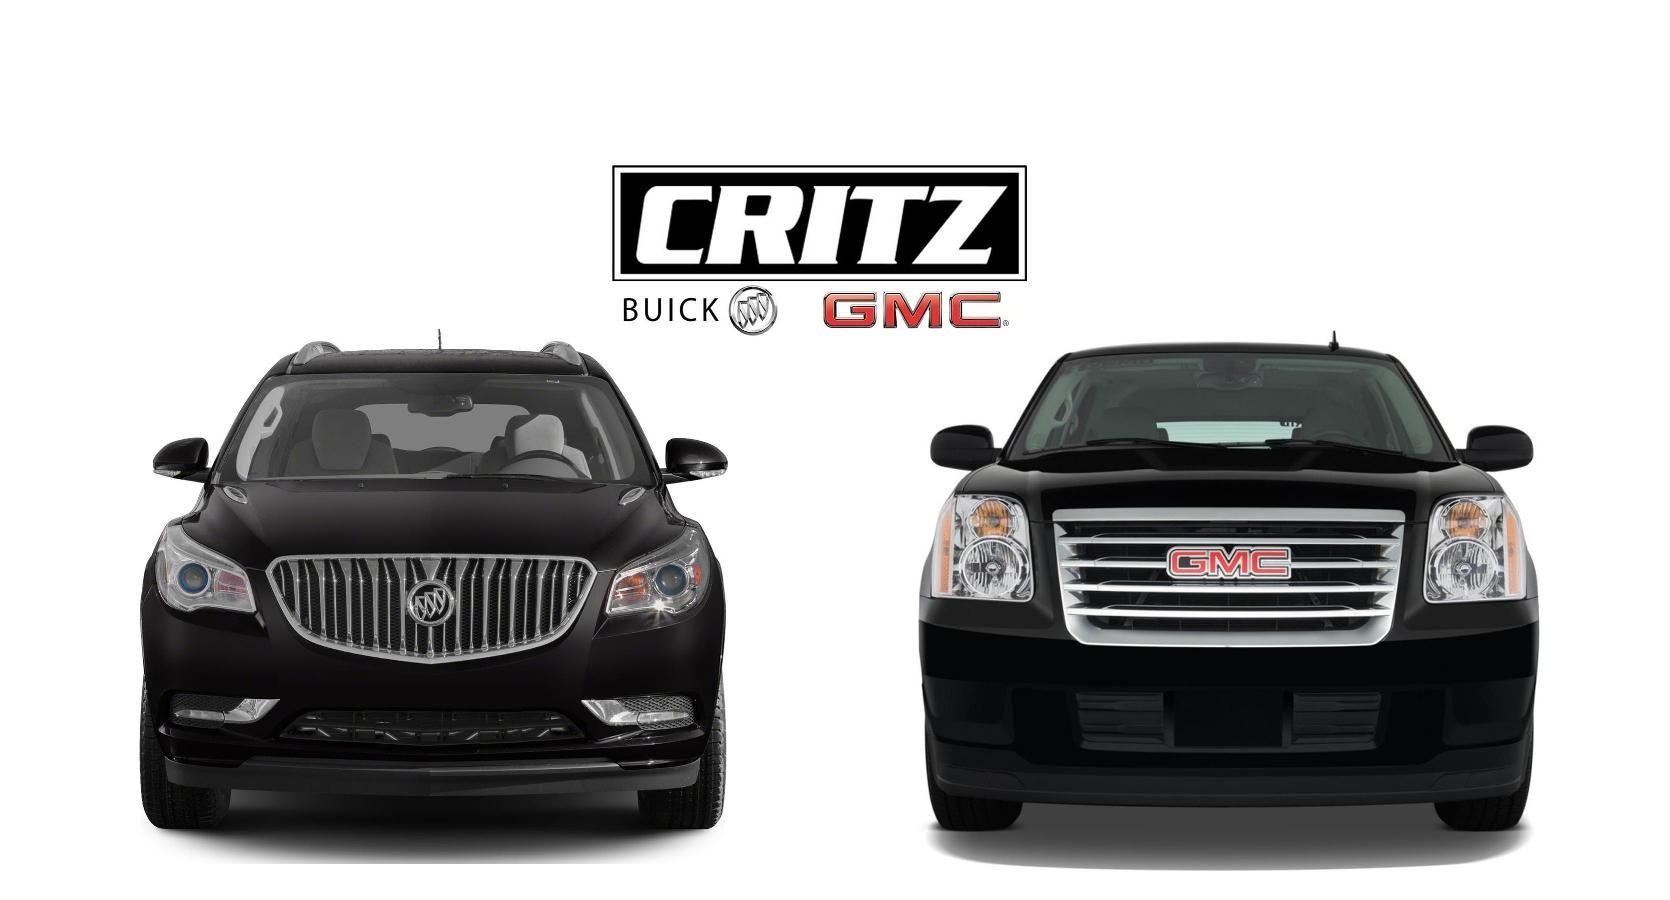 Critz Auto Group in Savannah, GA | Gmc vehicles, Buick gmc